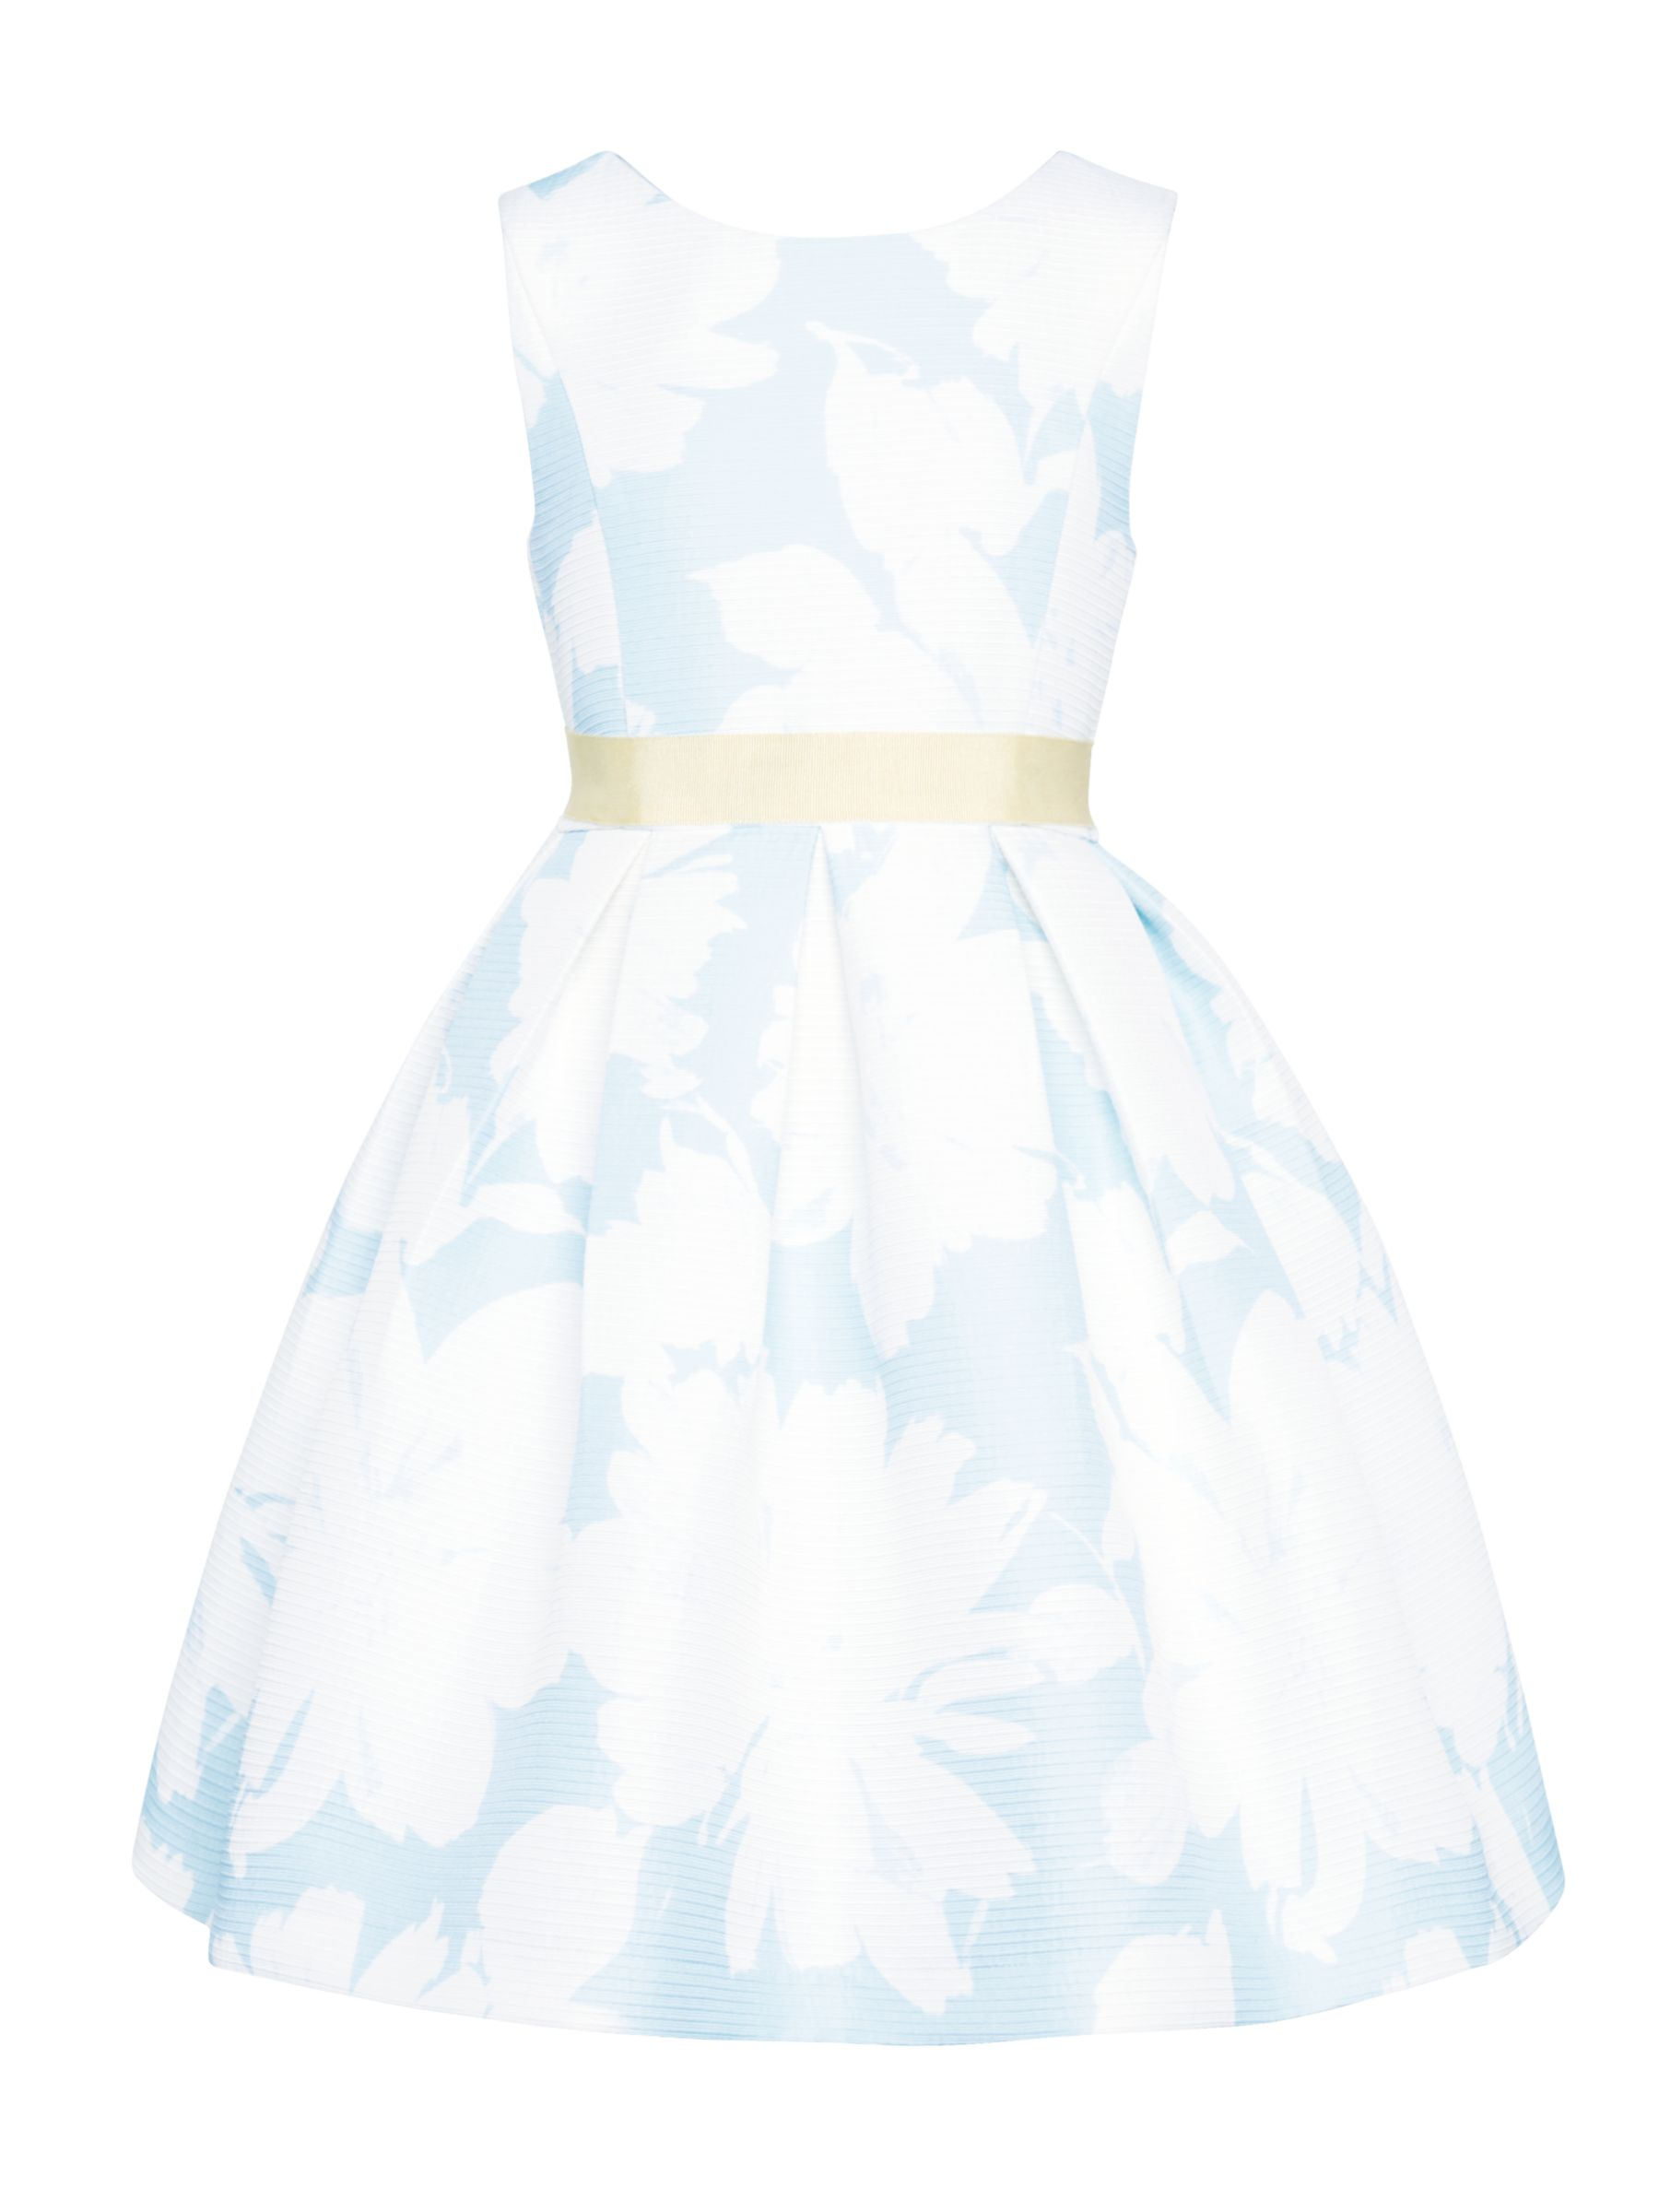 John Lewis Heirloom Collection John Lewis Heirloom Collection Girls' Textured Print Dress, Blue